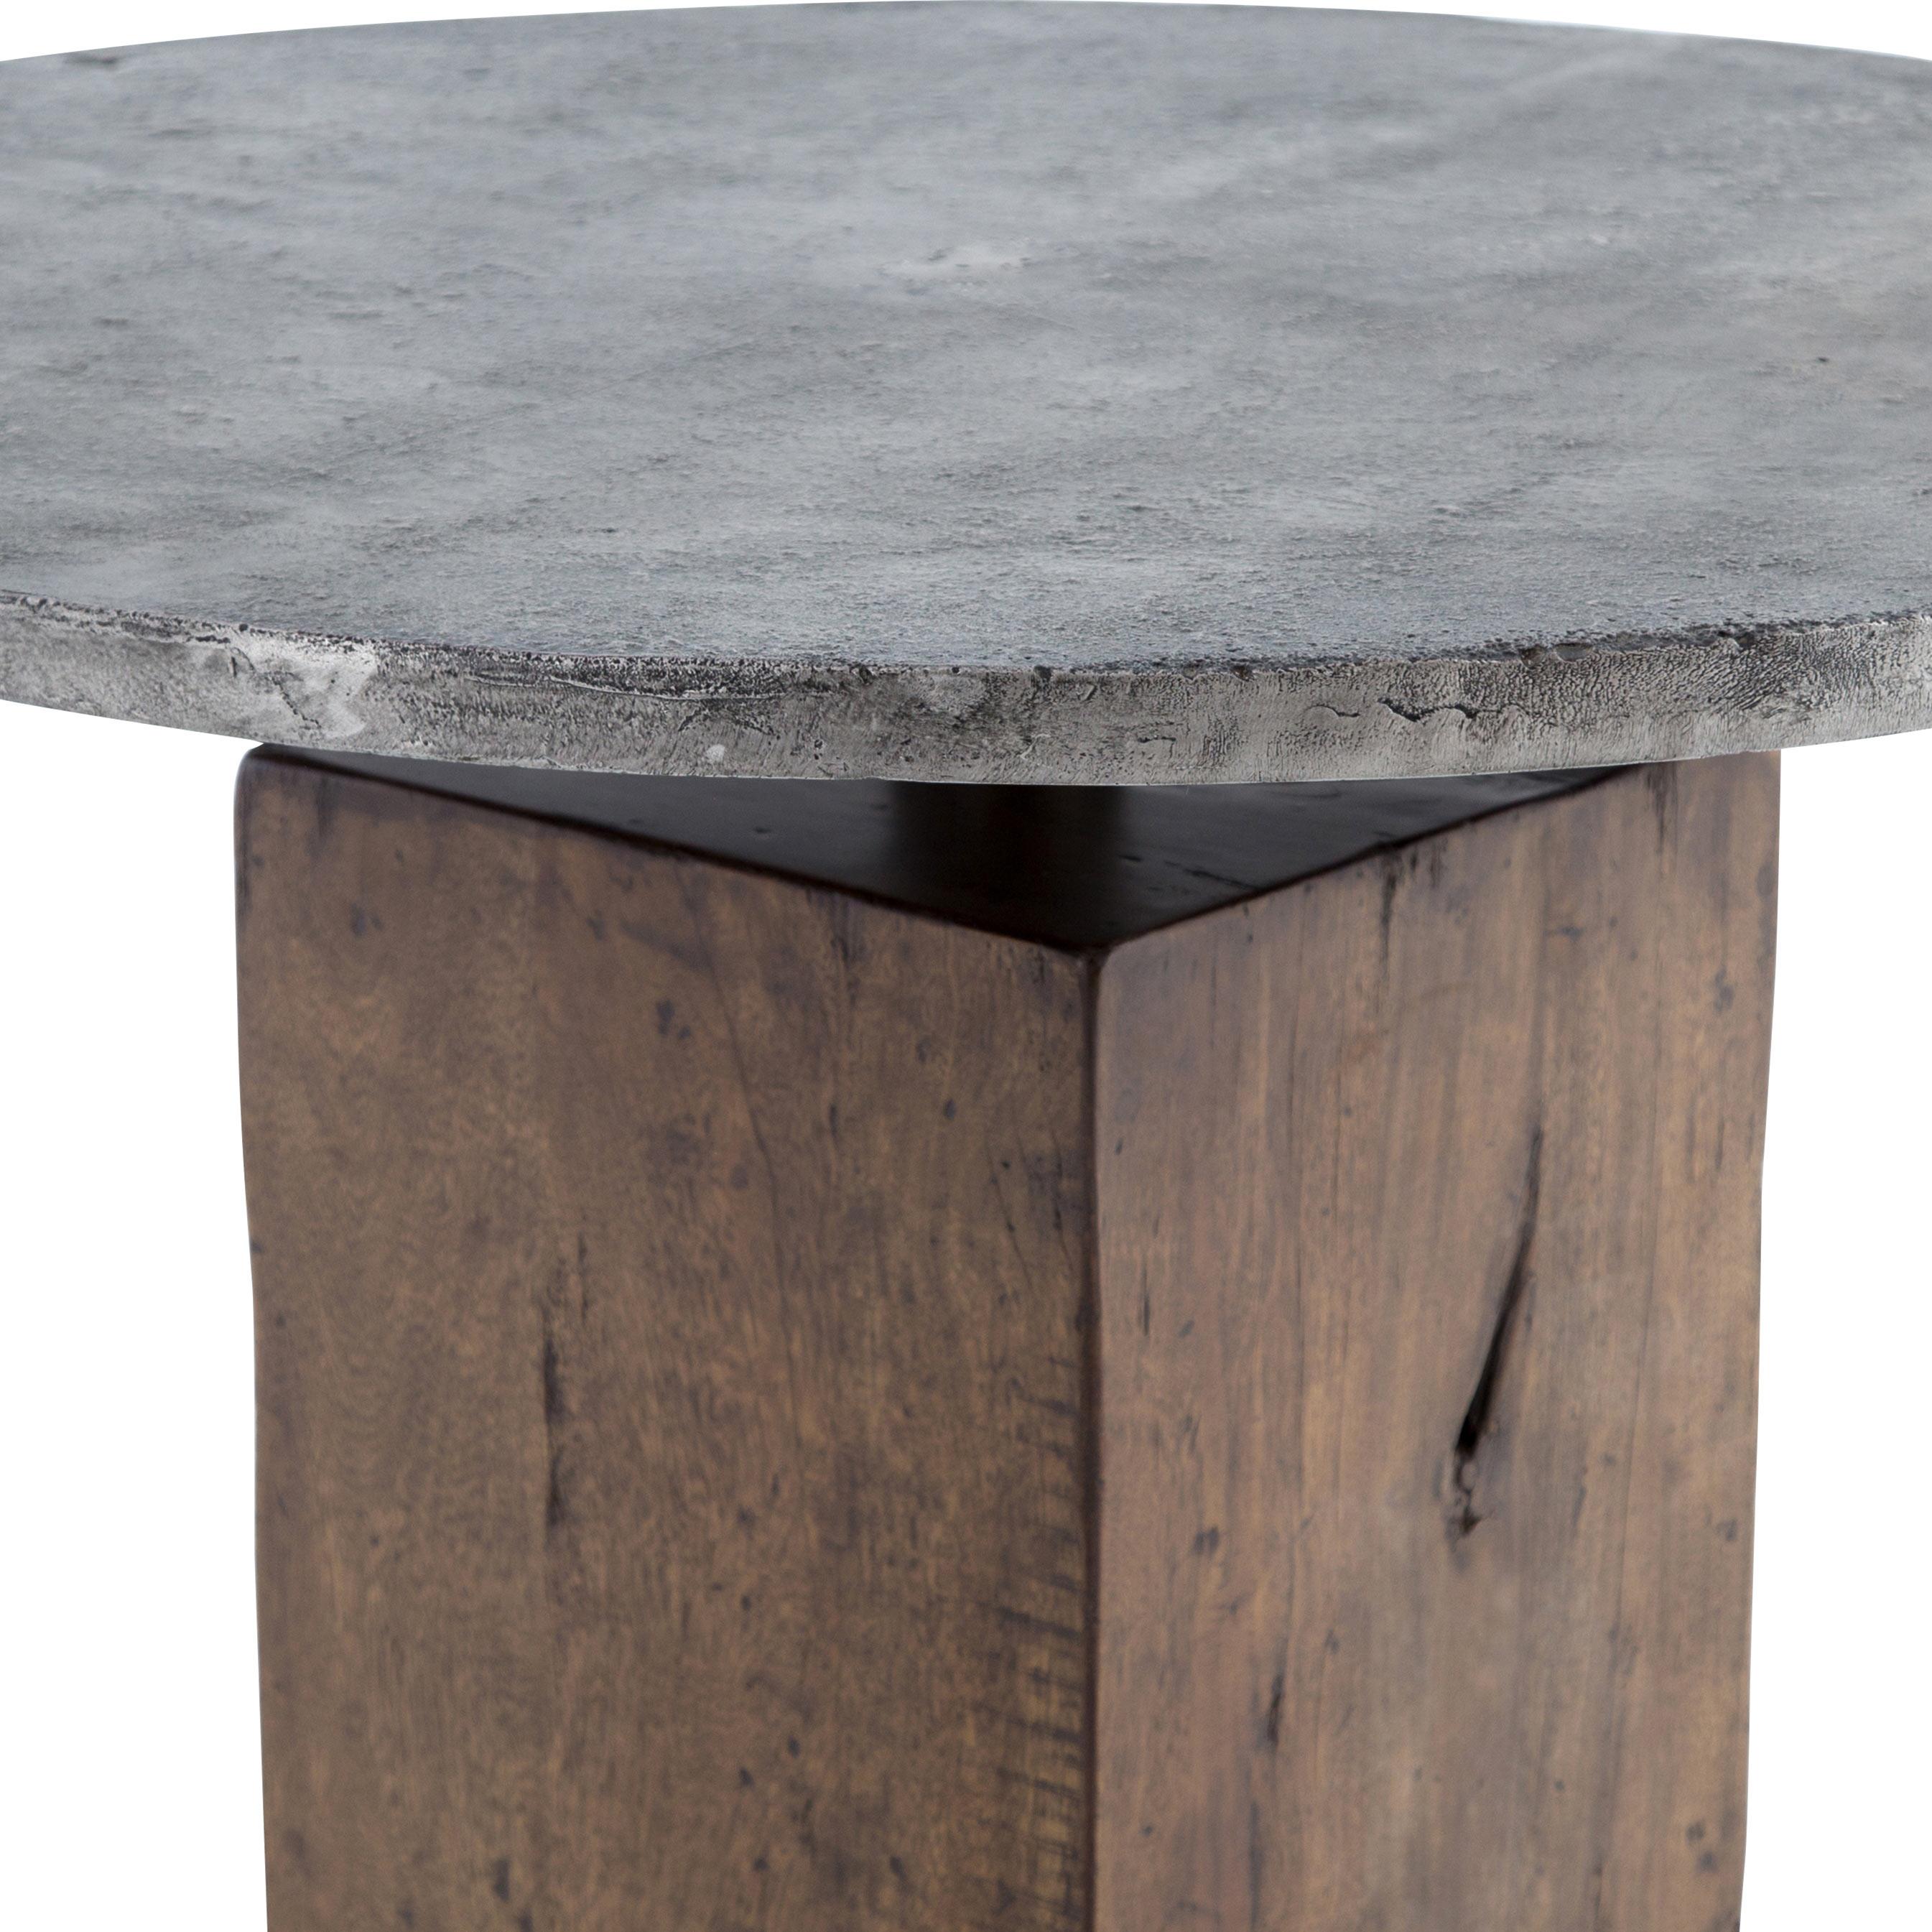 Levitan Industrial Lodge Weathered Wood Metal Round Bistro Table